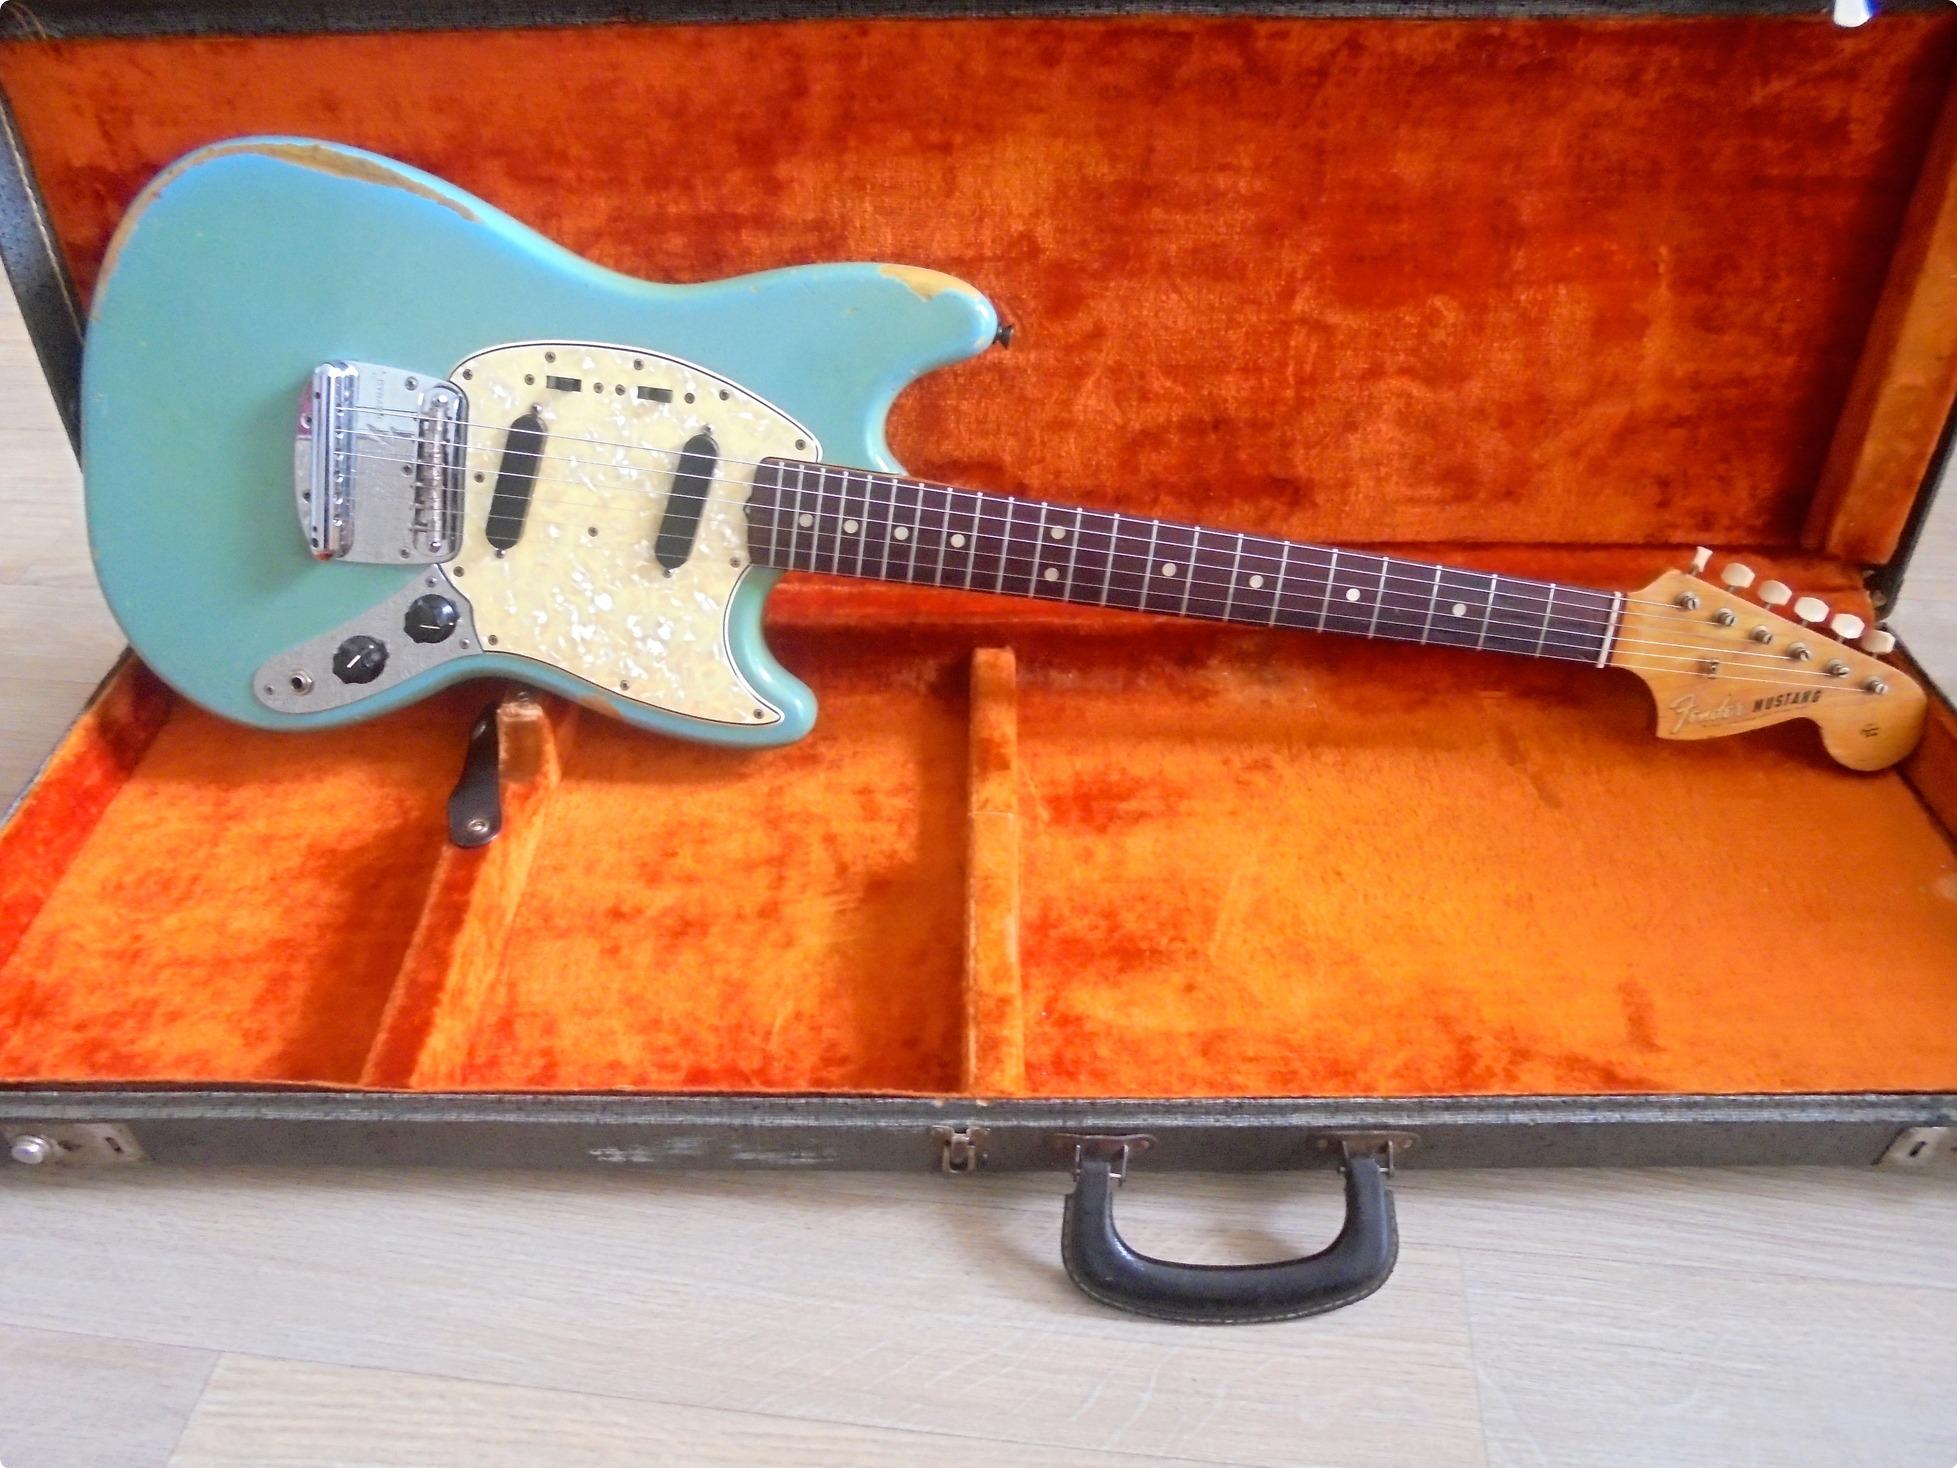 fender mustang 1966 guitar for sale pascal waisapy guitars. Black Bedroom Furniture Sets. Home Design Ideas